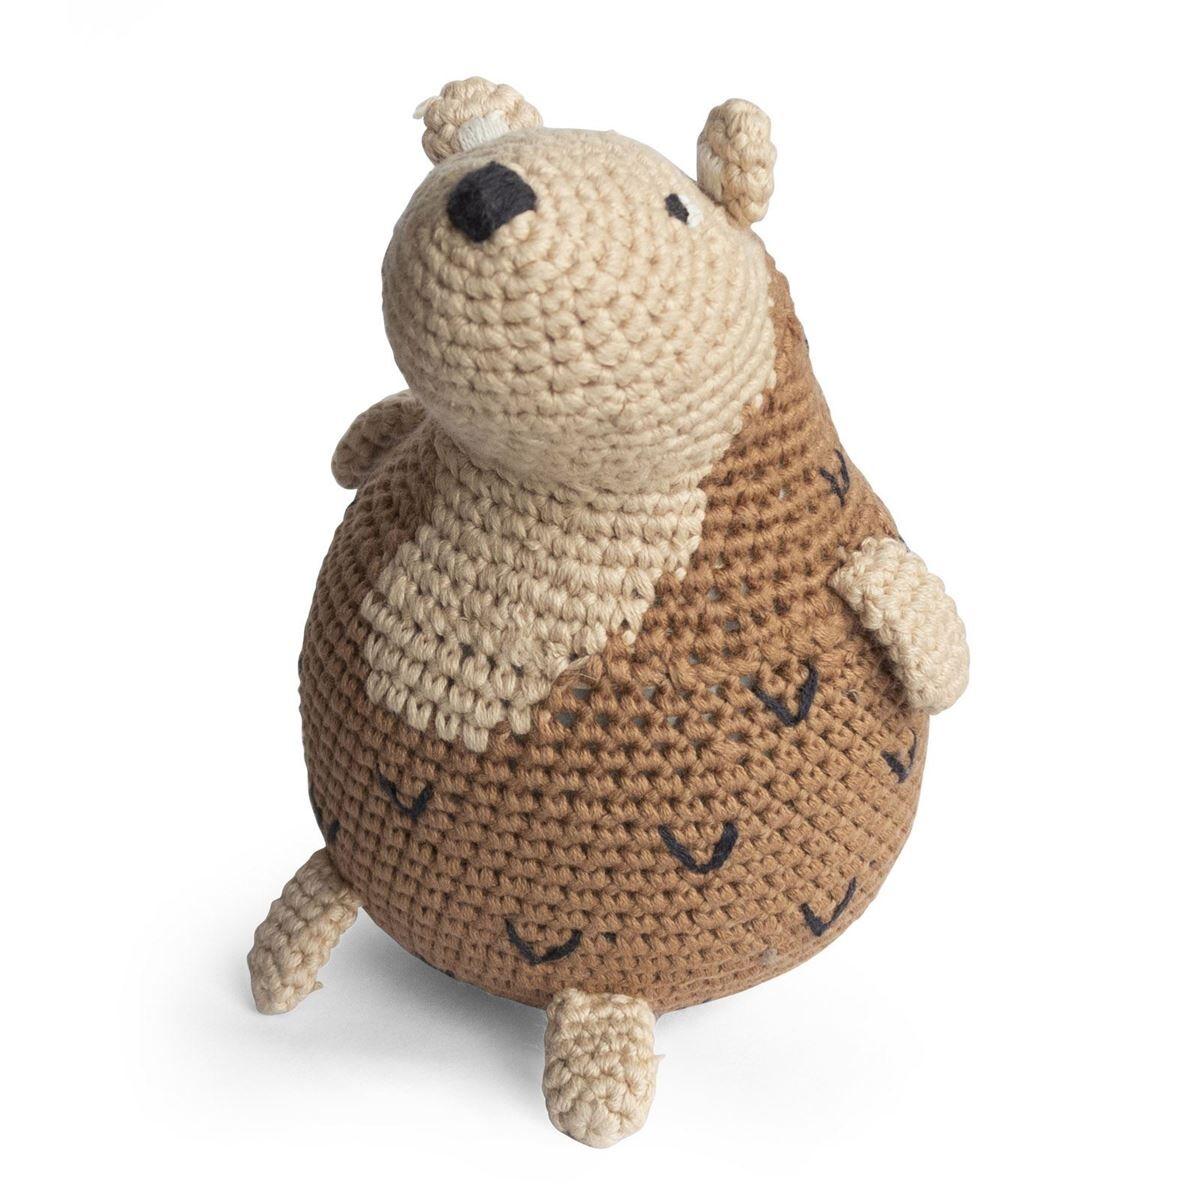 Sebra Heklet Tumledukke, Twinkle the hedgehog